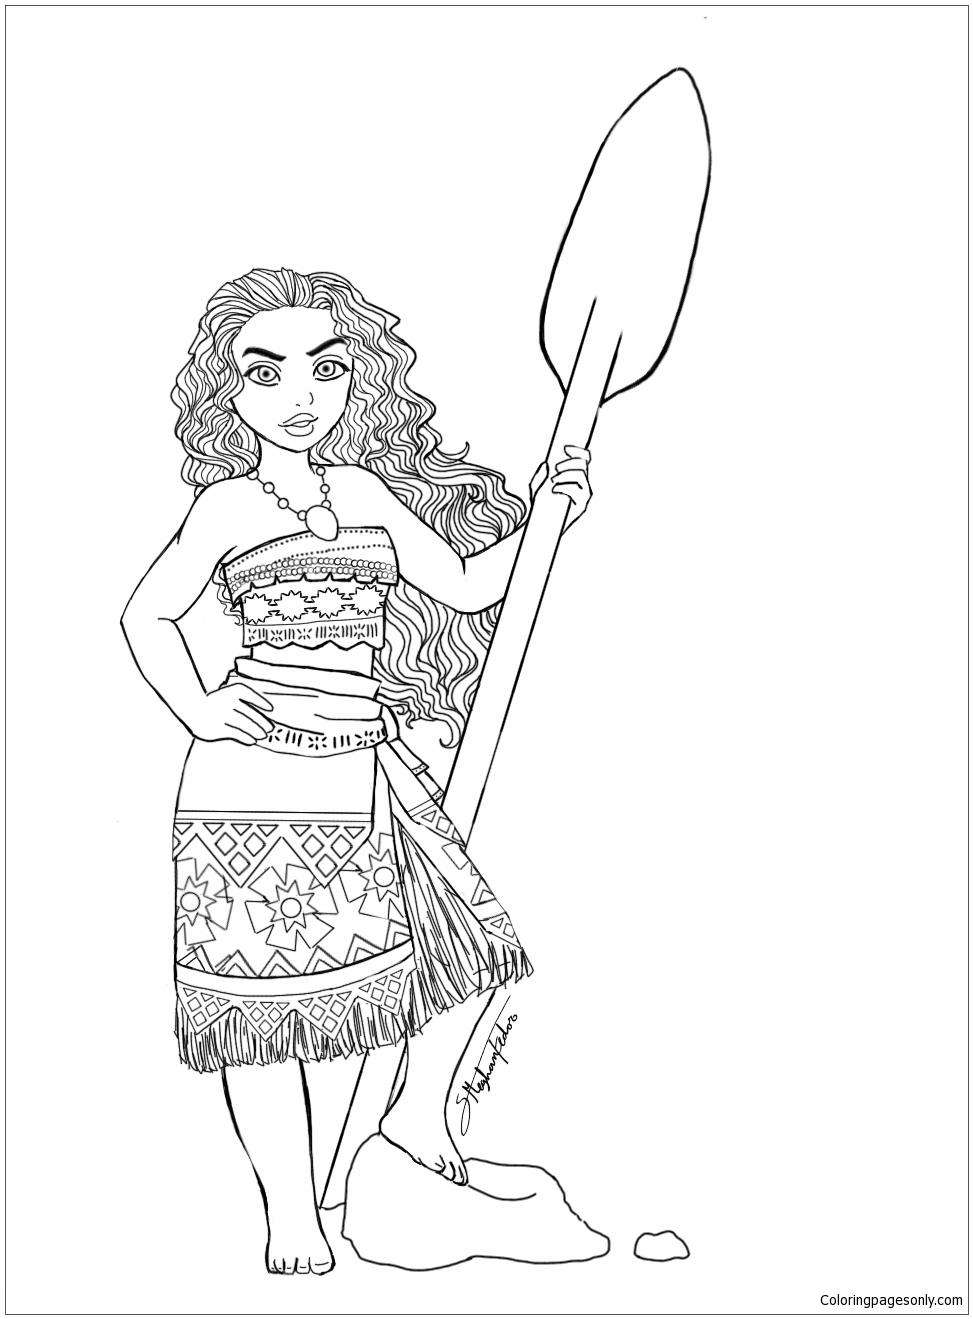 Moana Princess 7 Coloring Page